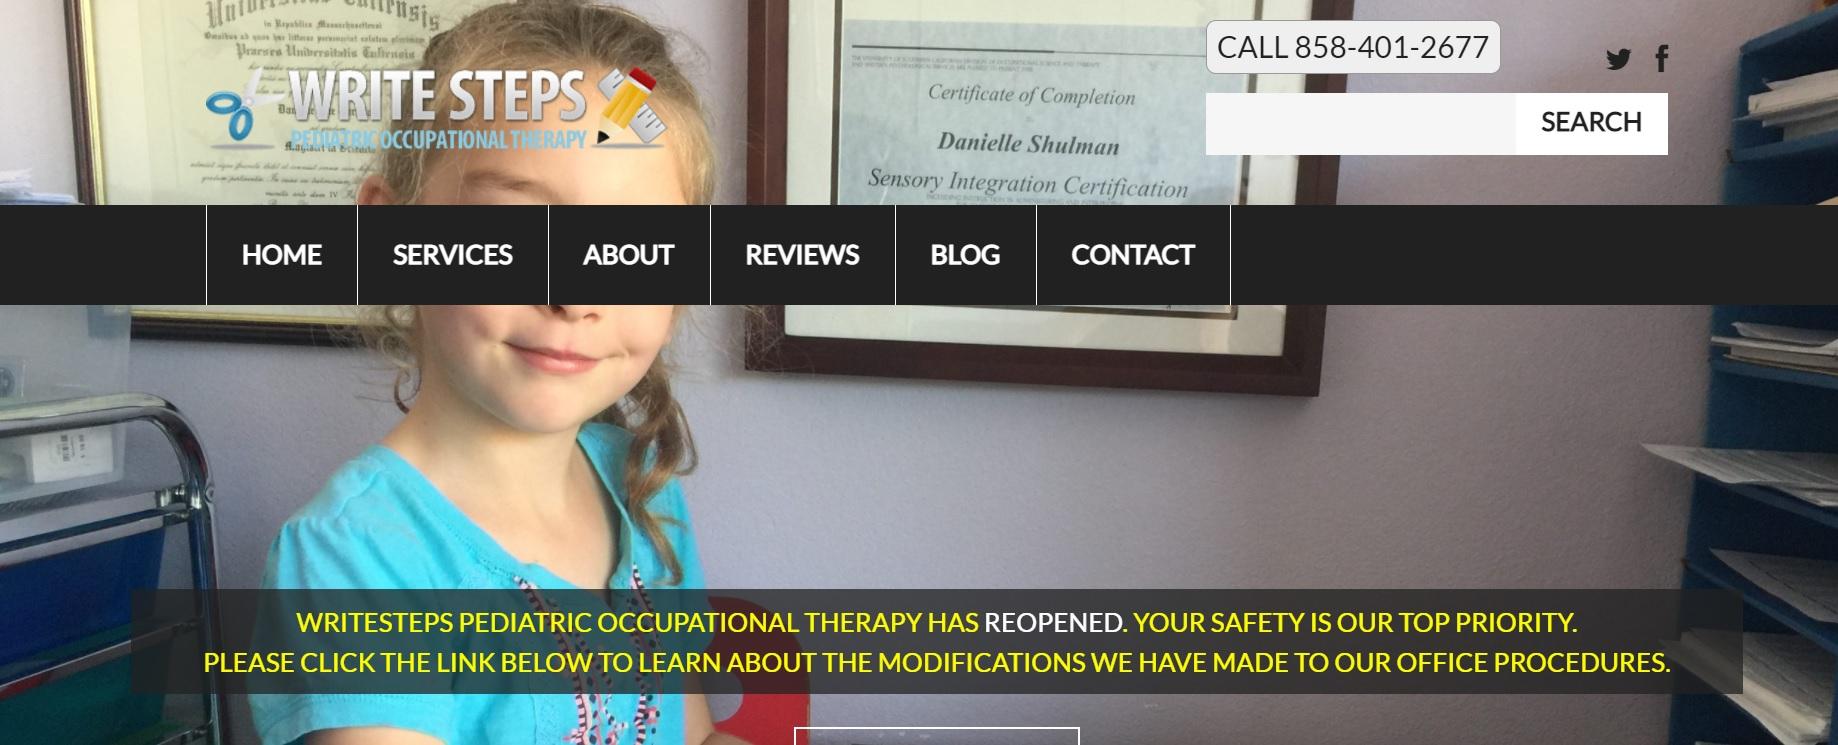 WriteSteps Pediatric Occupational Therapy